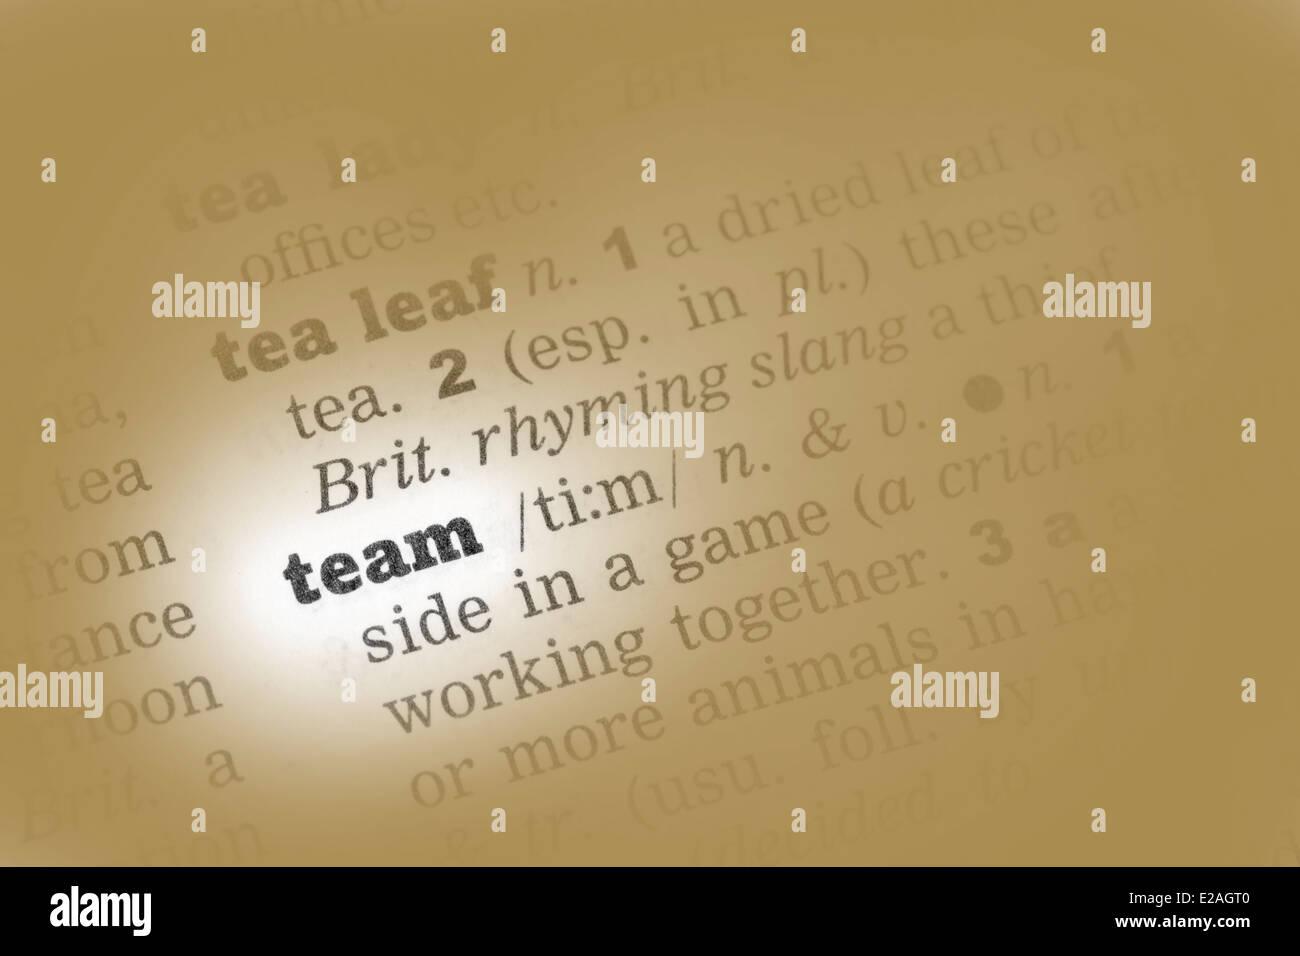 Team Definition Of Team At Dictionary Com >> Team Dictionary Definition Single Word Stock Photos Team